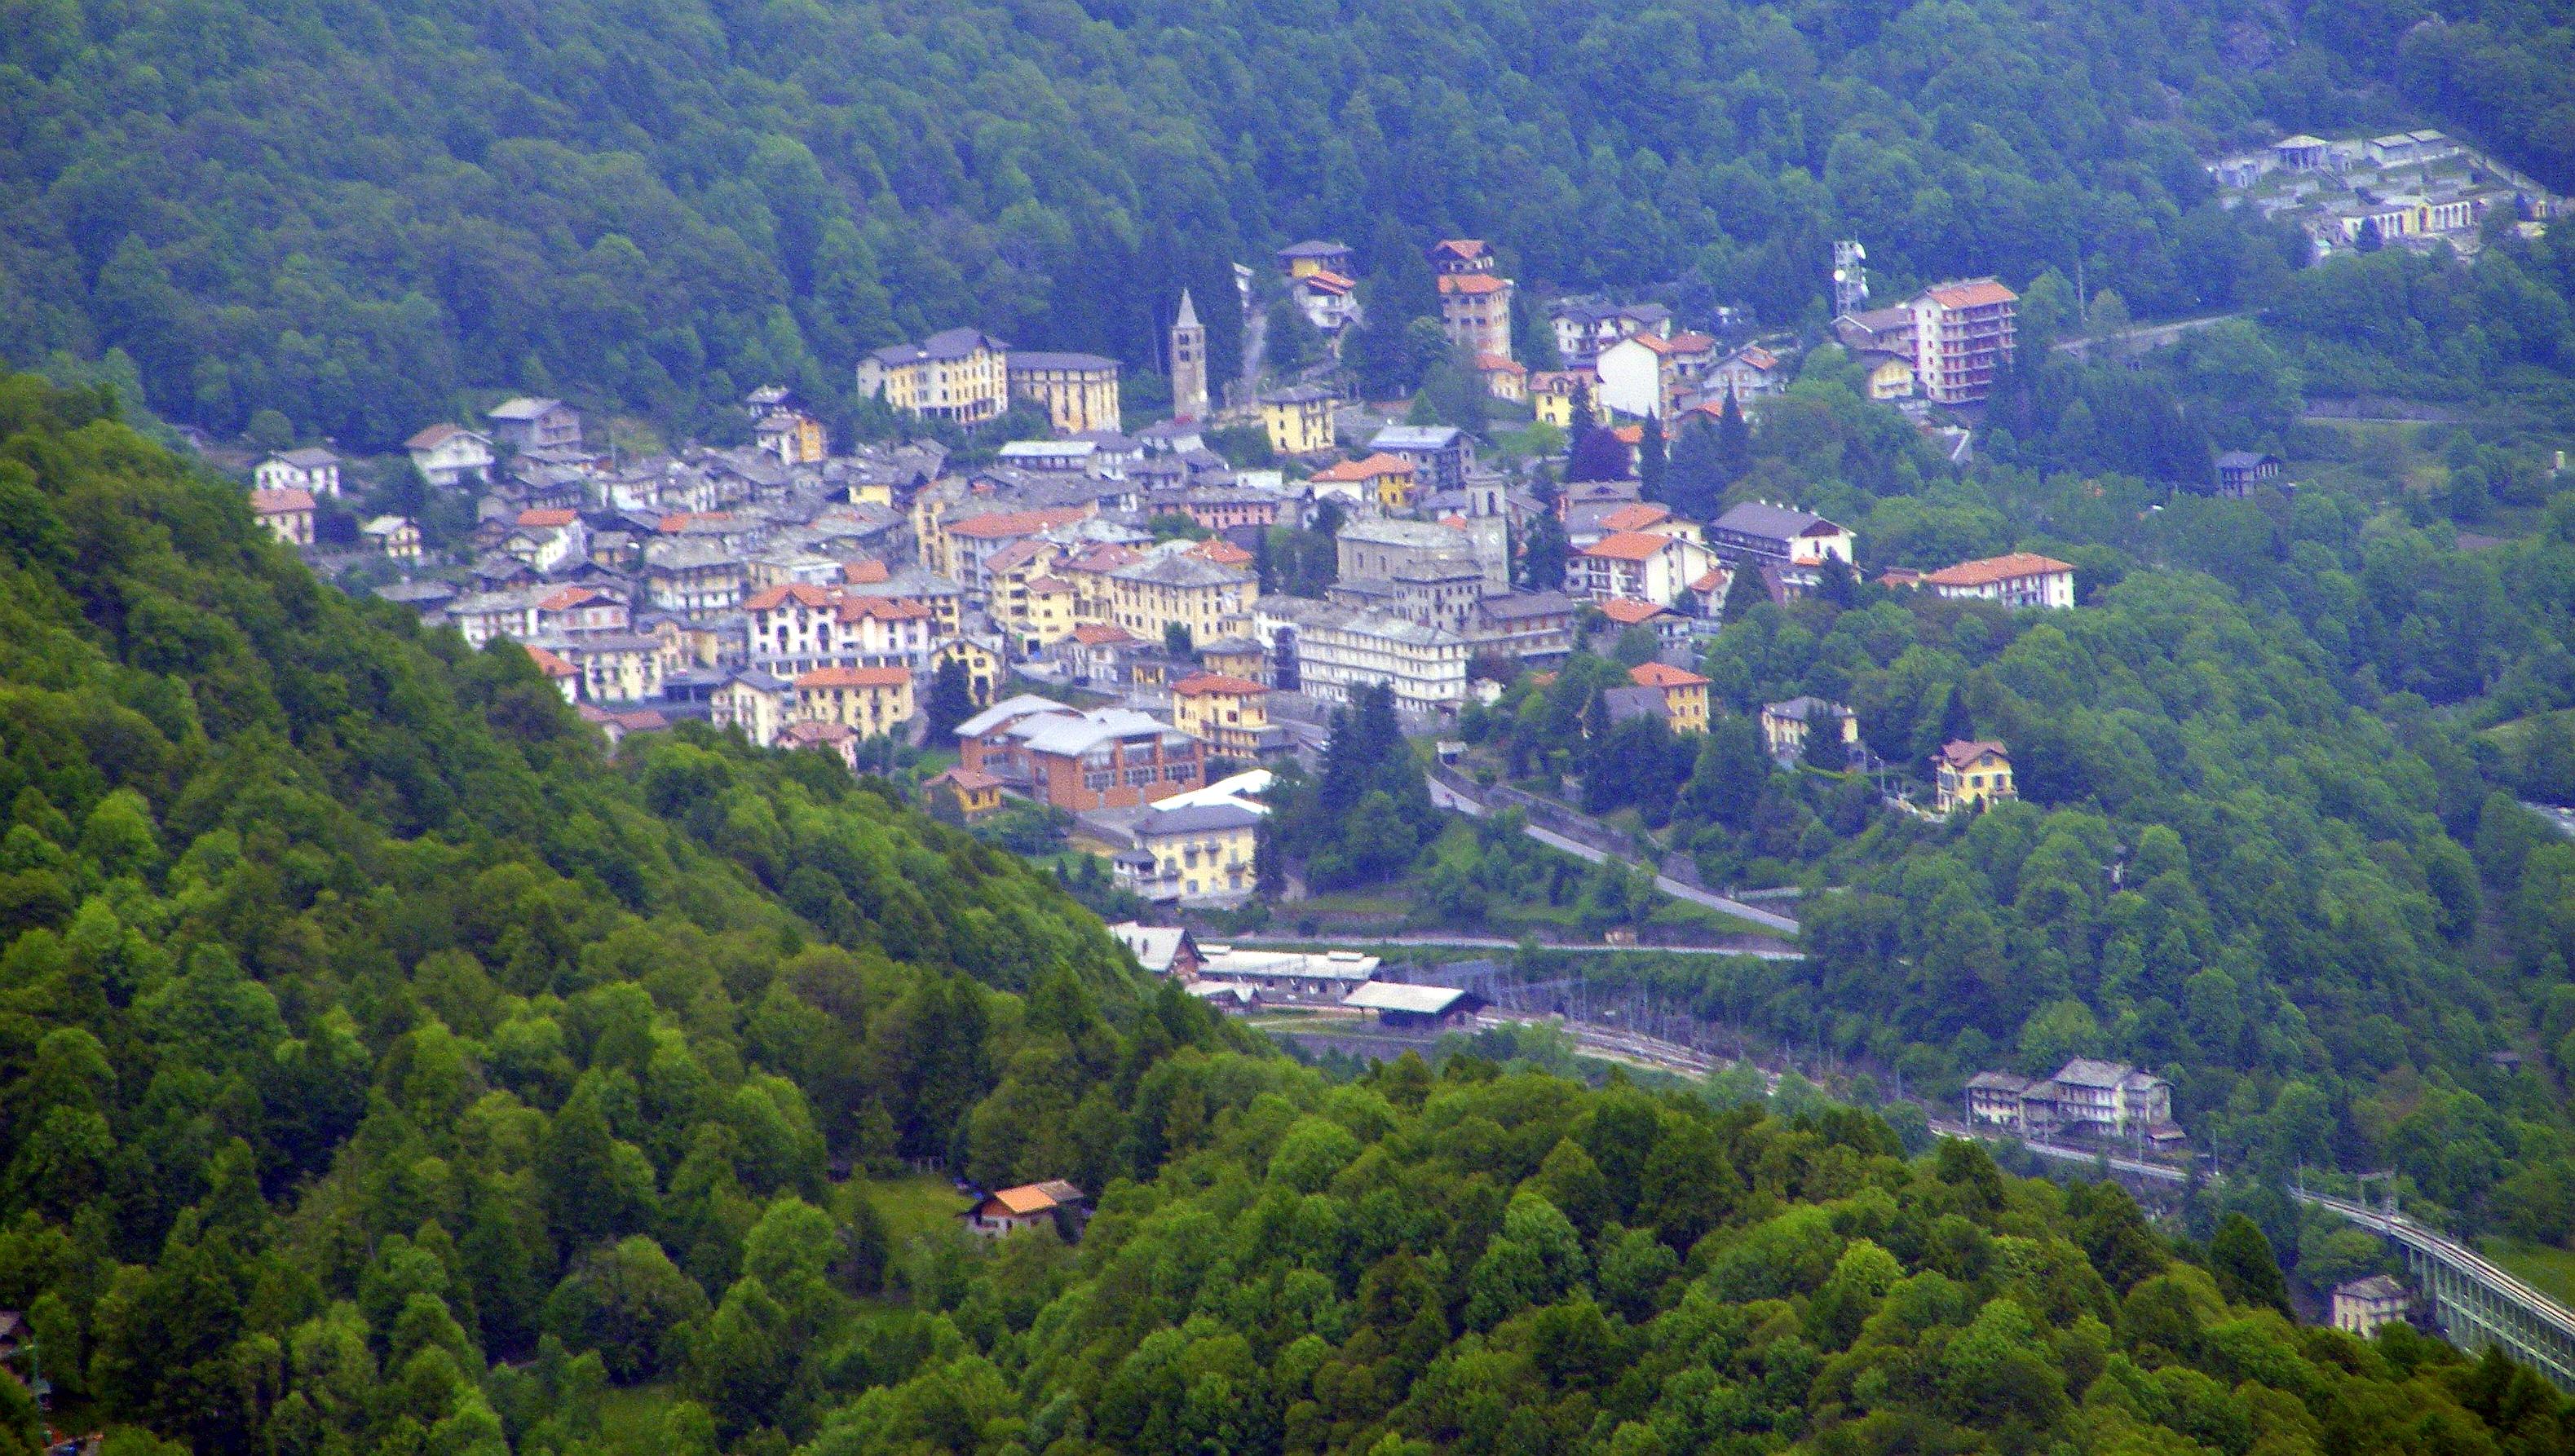 Ceres (Itaalia)